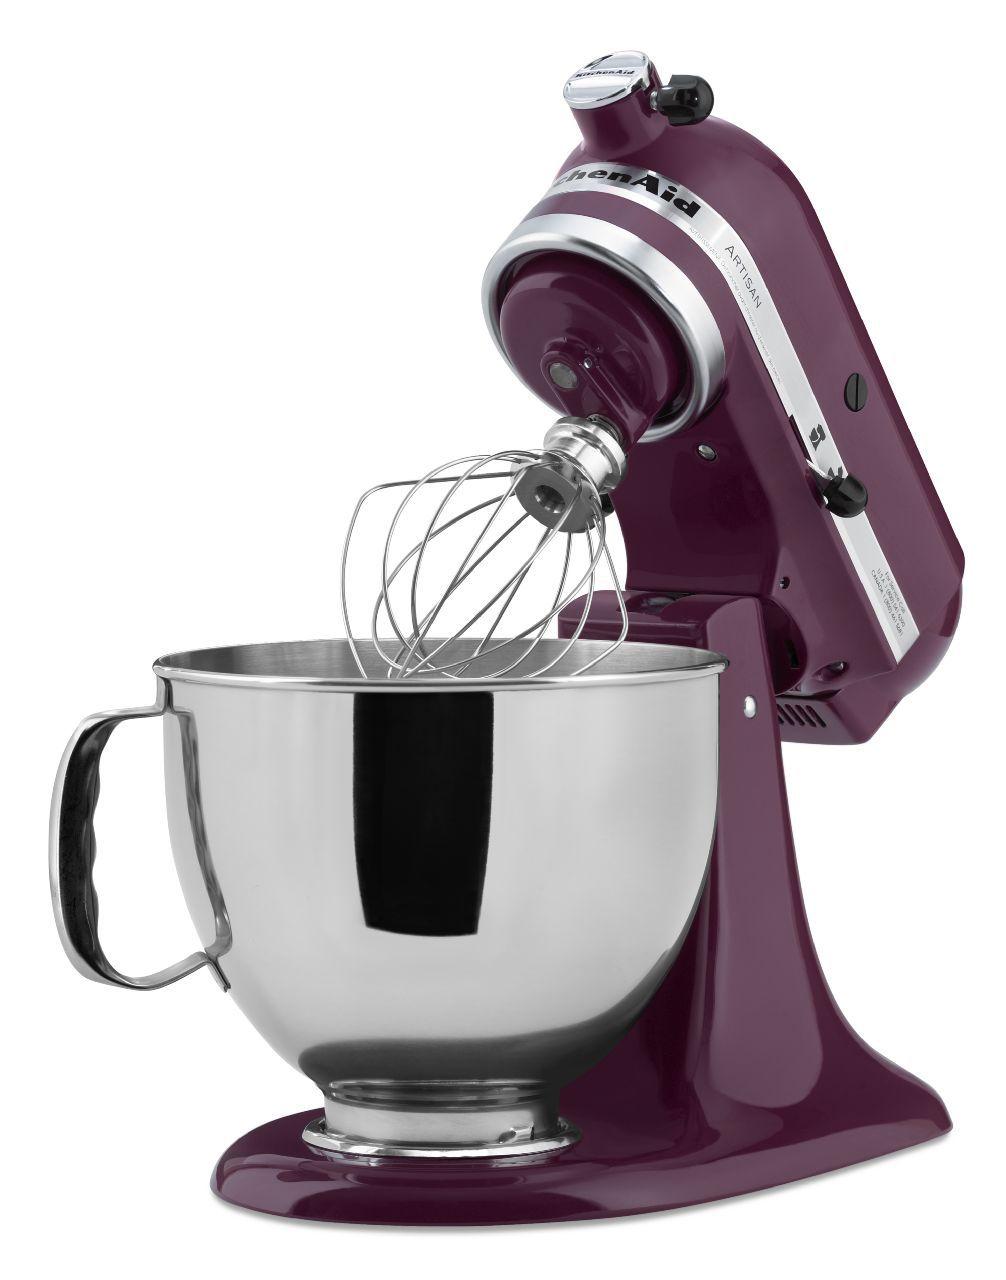 Kitchenaid Artisan Boysenberry Stand Mixer Ksm150psby